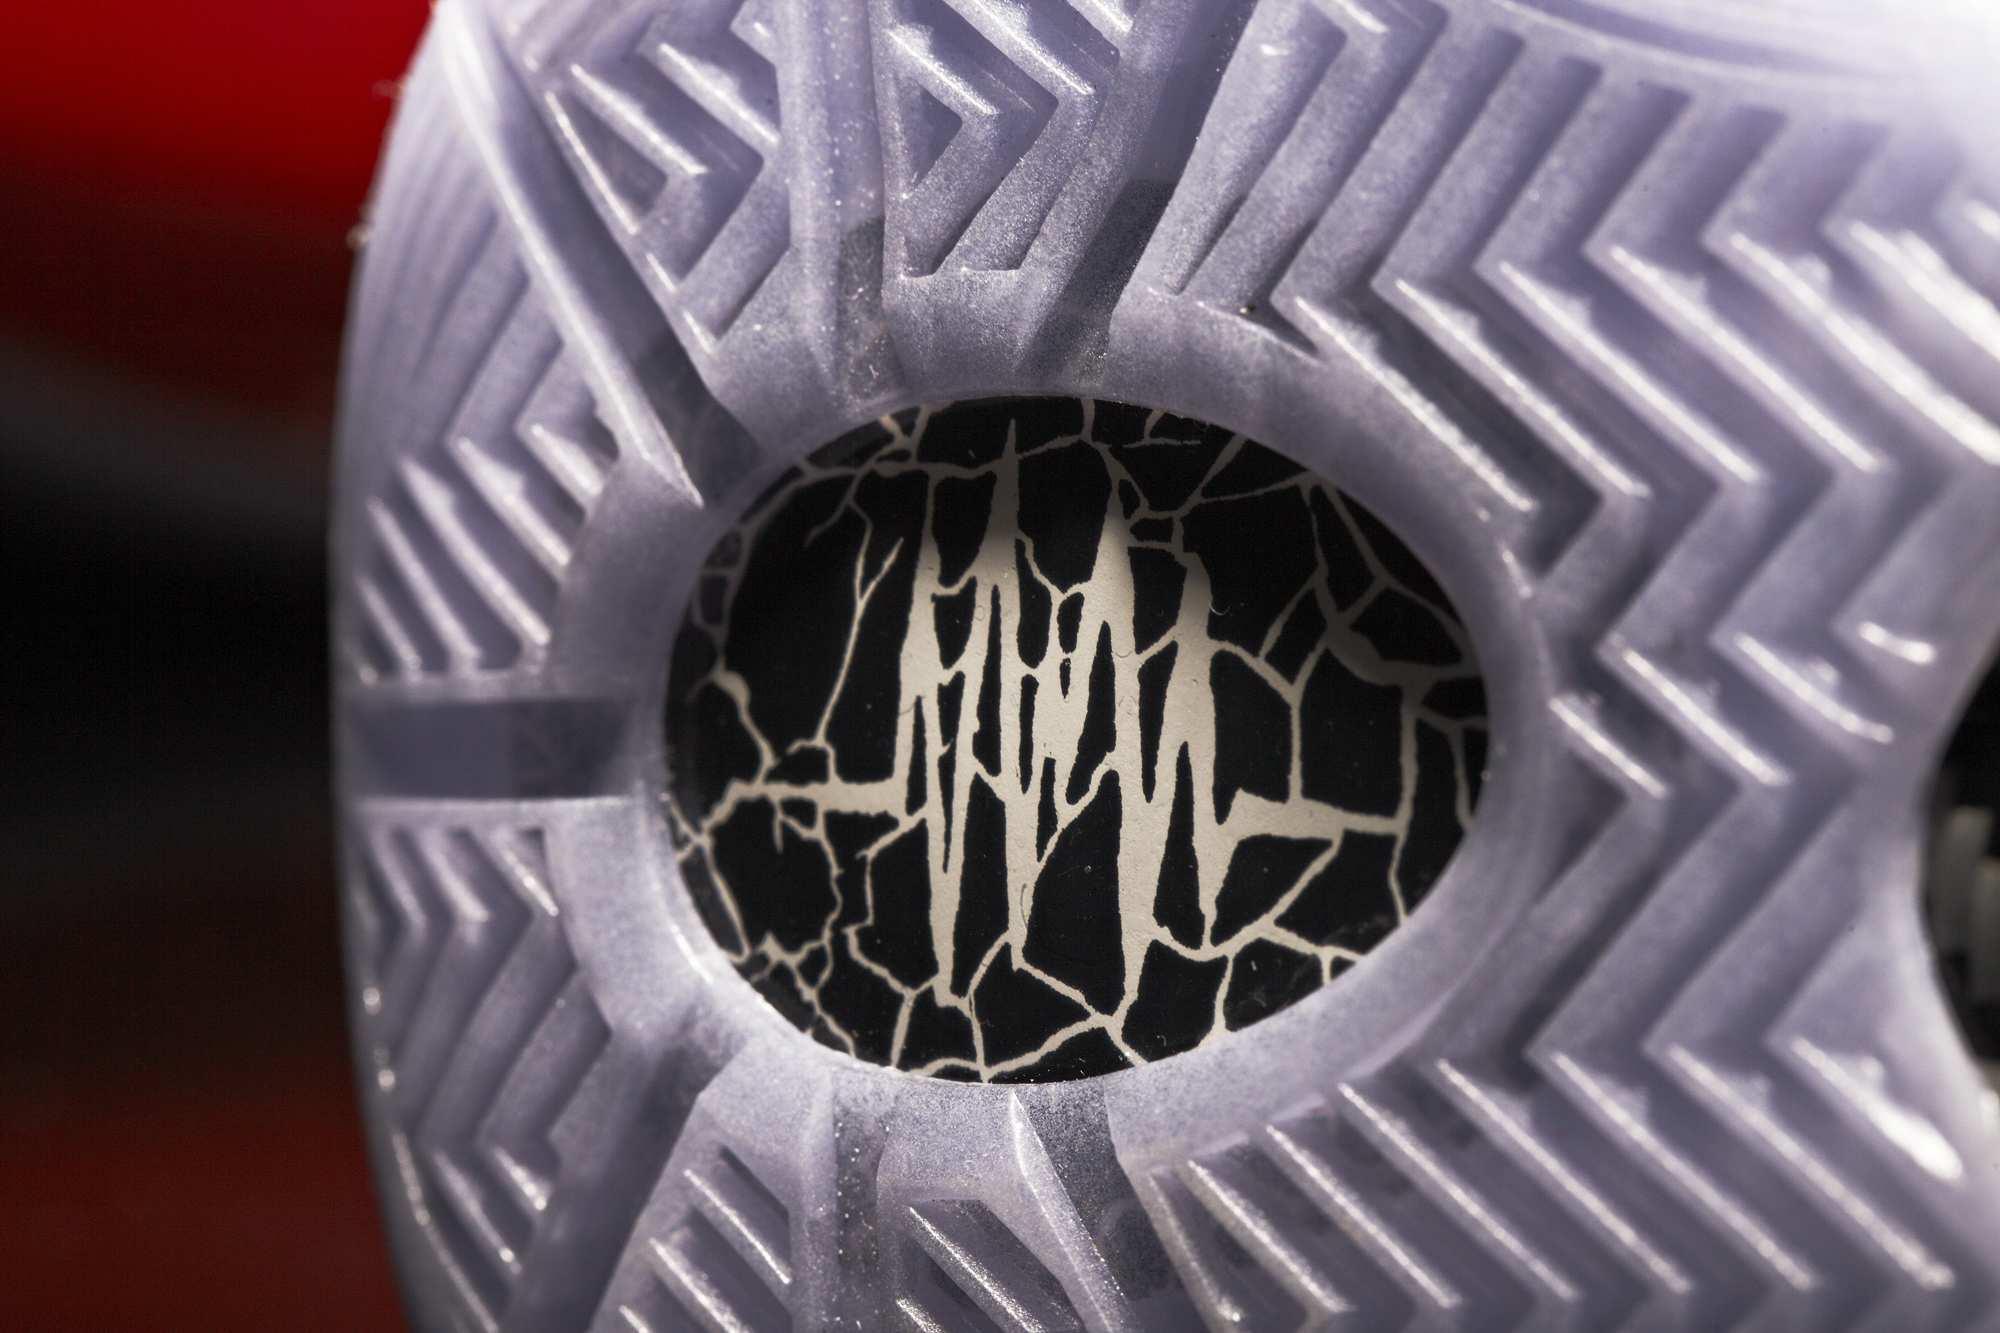 TAGS Blake Griffin Nike Nike Basketball Nike Zoom Hyperfuse 2011